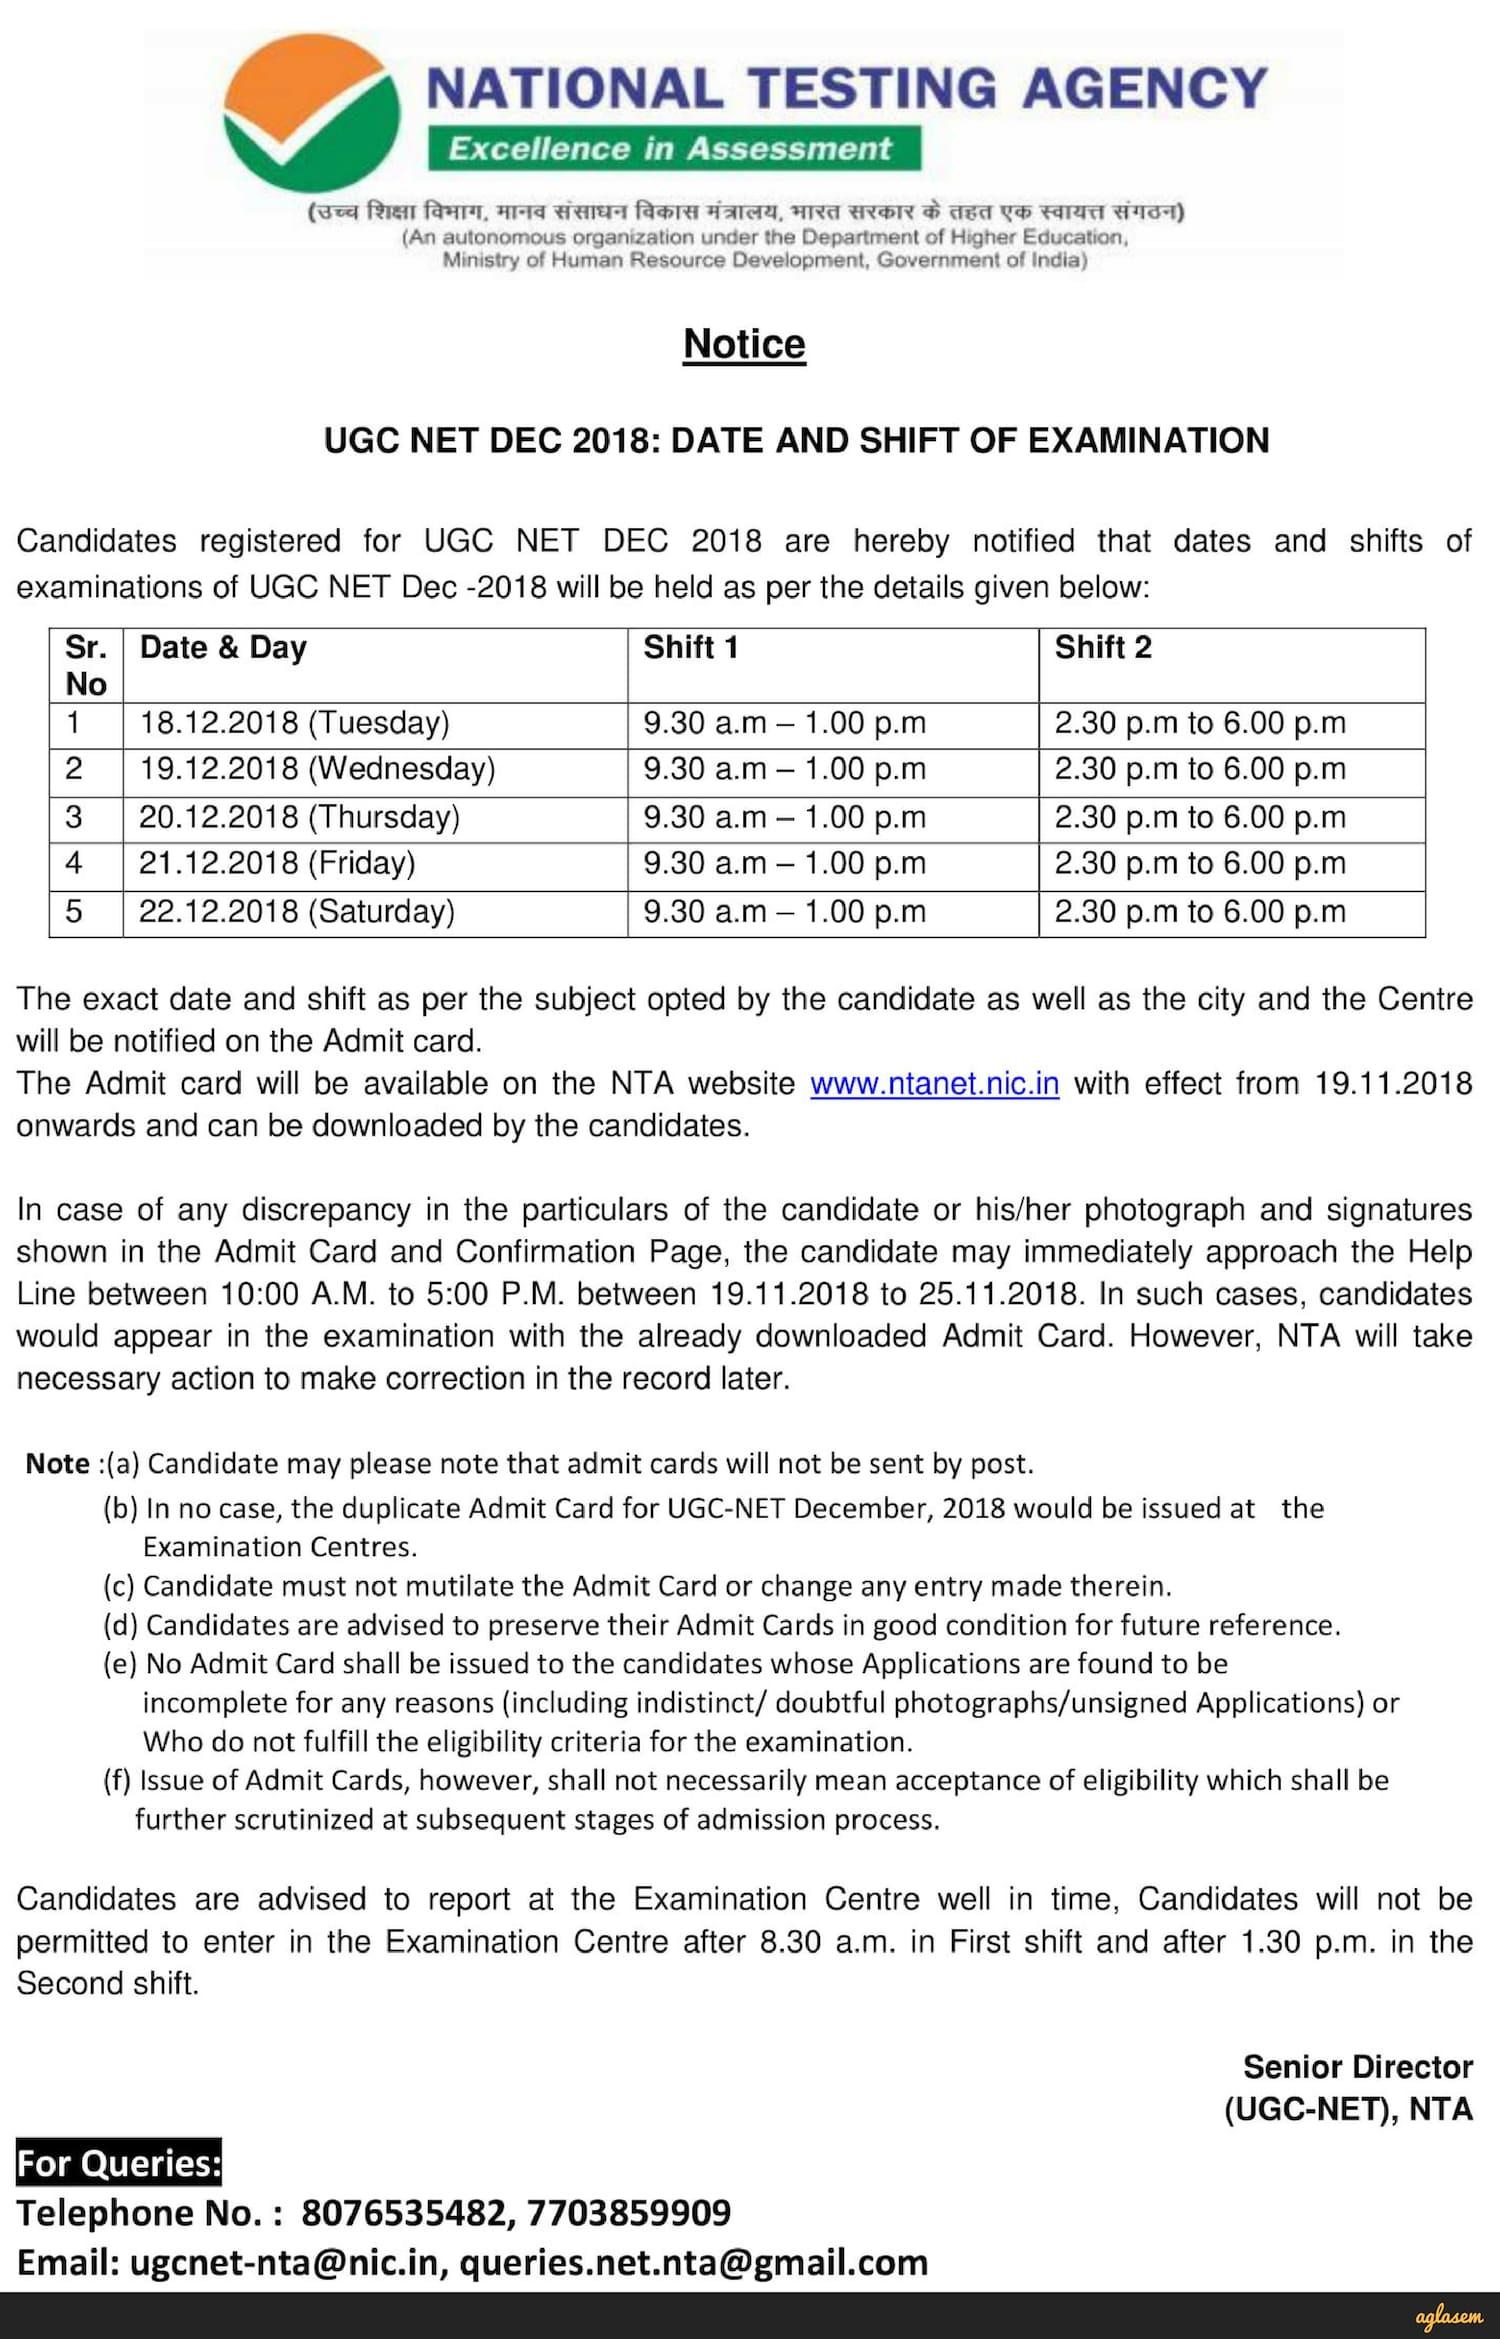 NTA announces UGC NET Dec 2018 exam date; Exam on 18, 19, 20, 21, 22 December